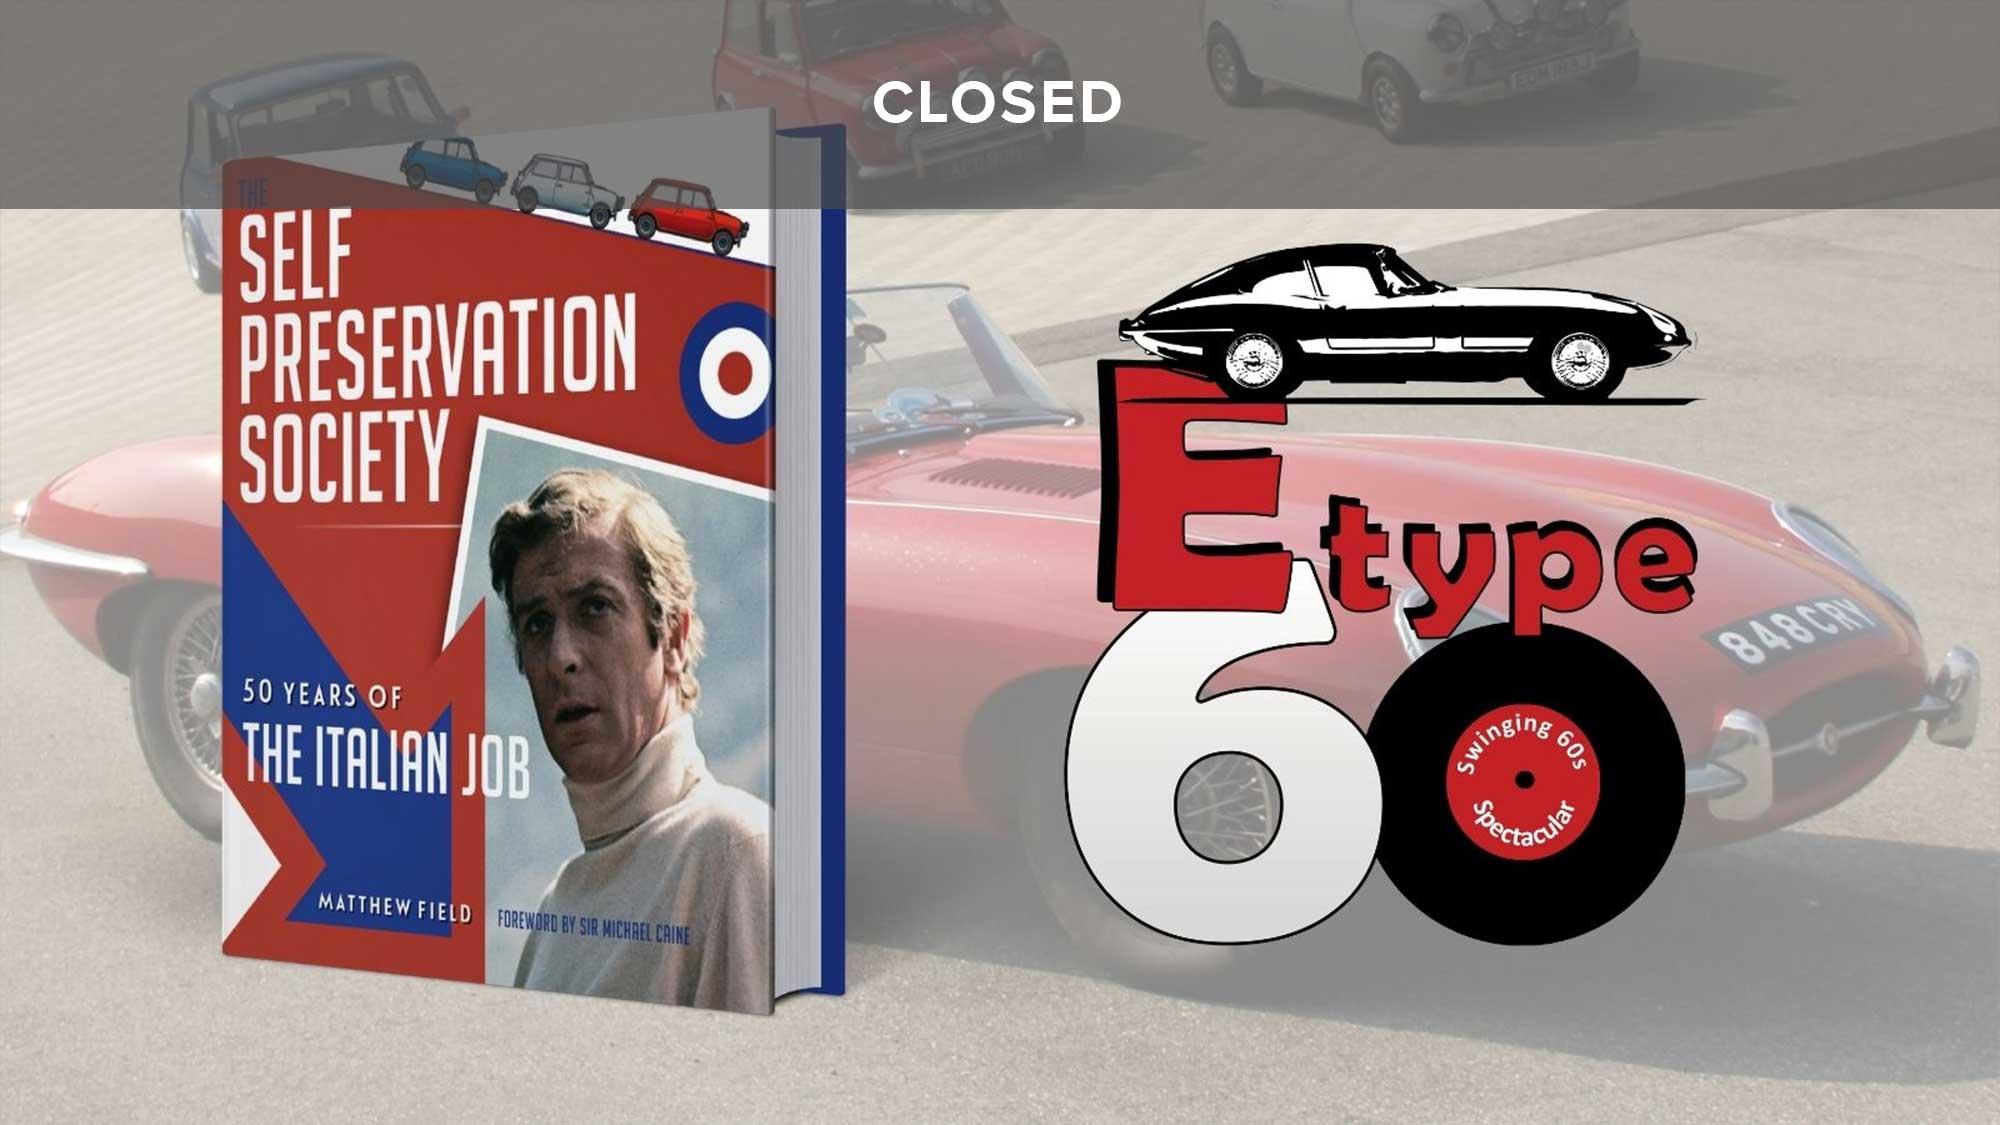 WIN a Jaguar E-type celebration package